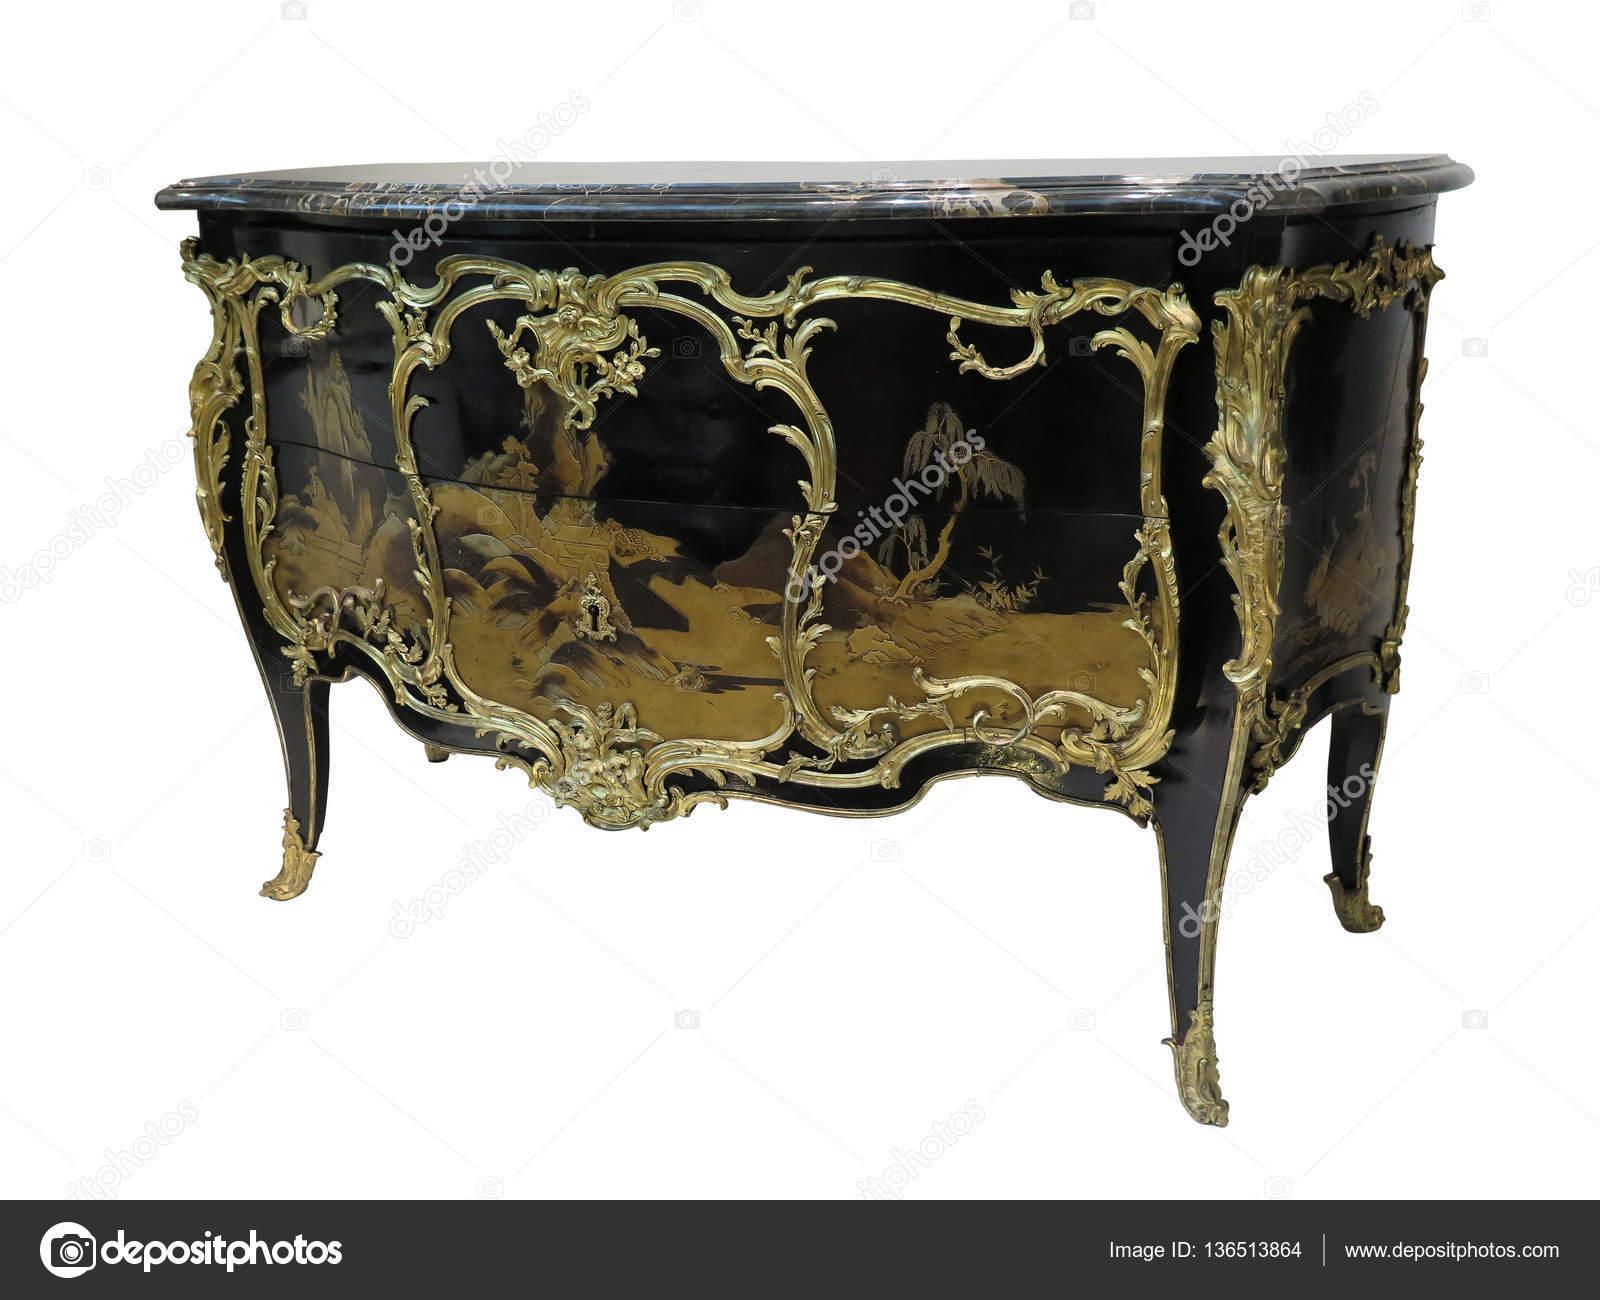 Antike Kommode Bekannt Als Kommode Holz Intarsien Messingbeschlage